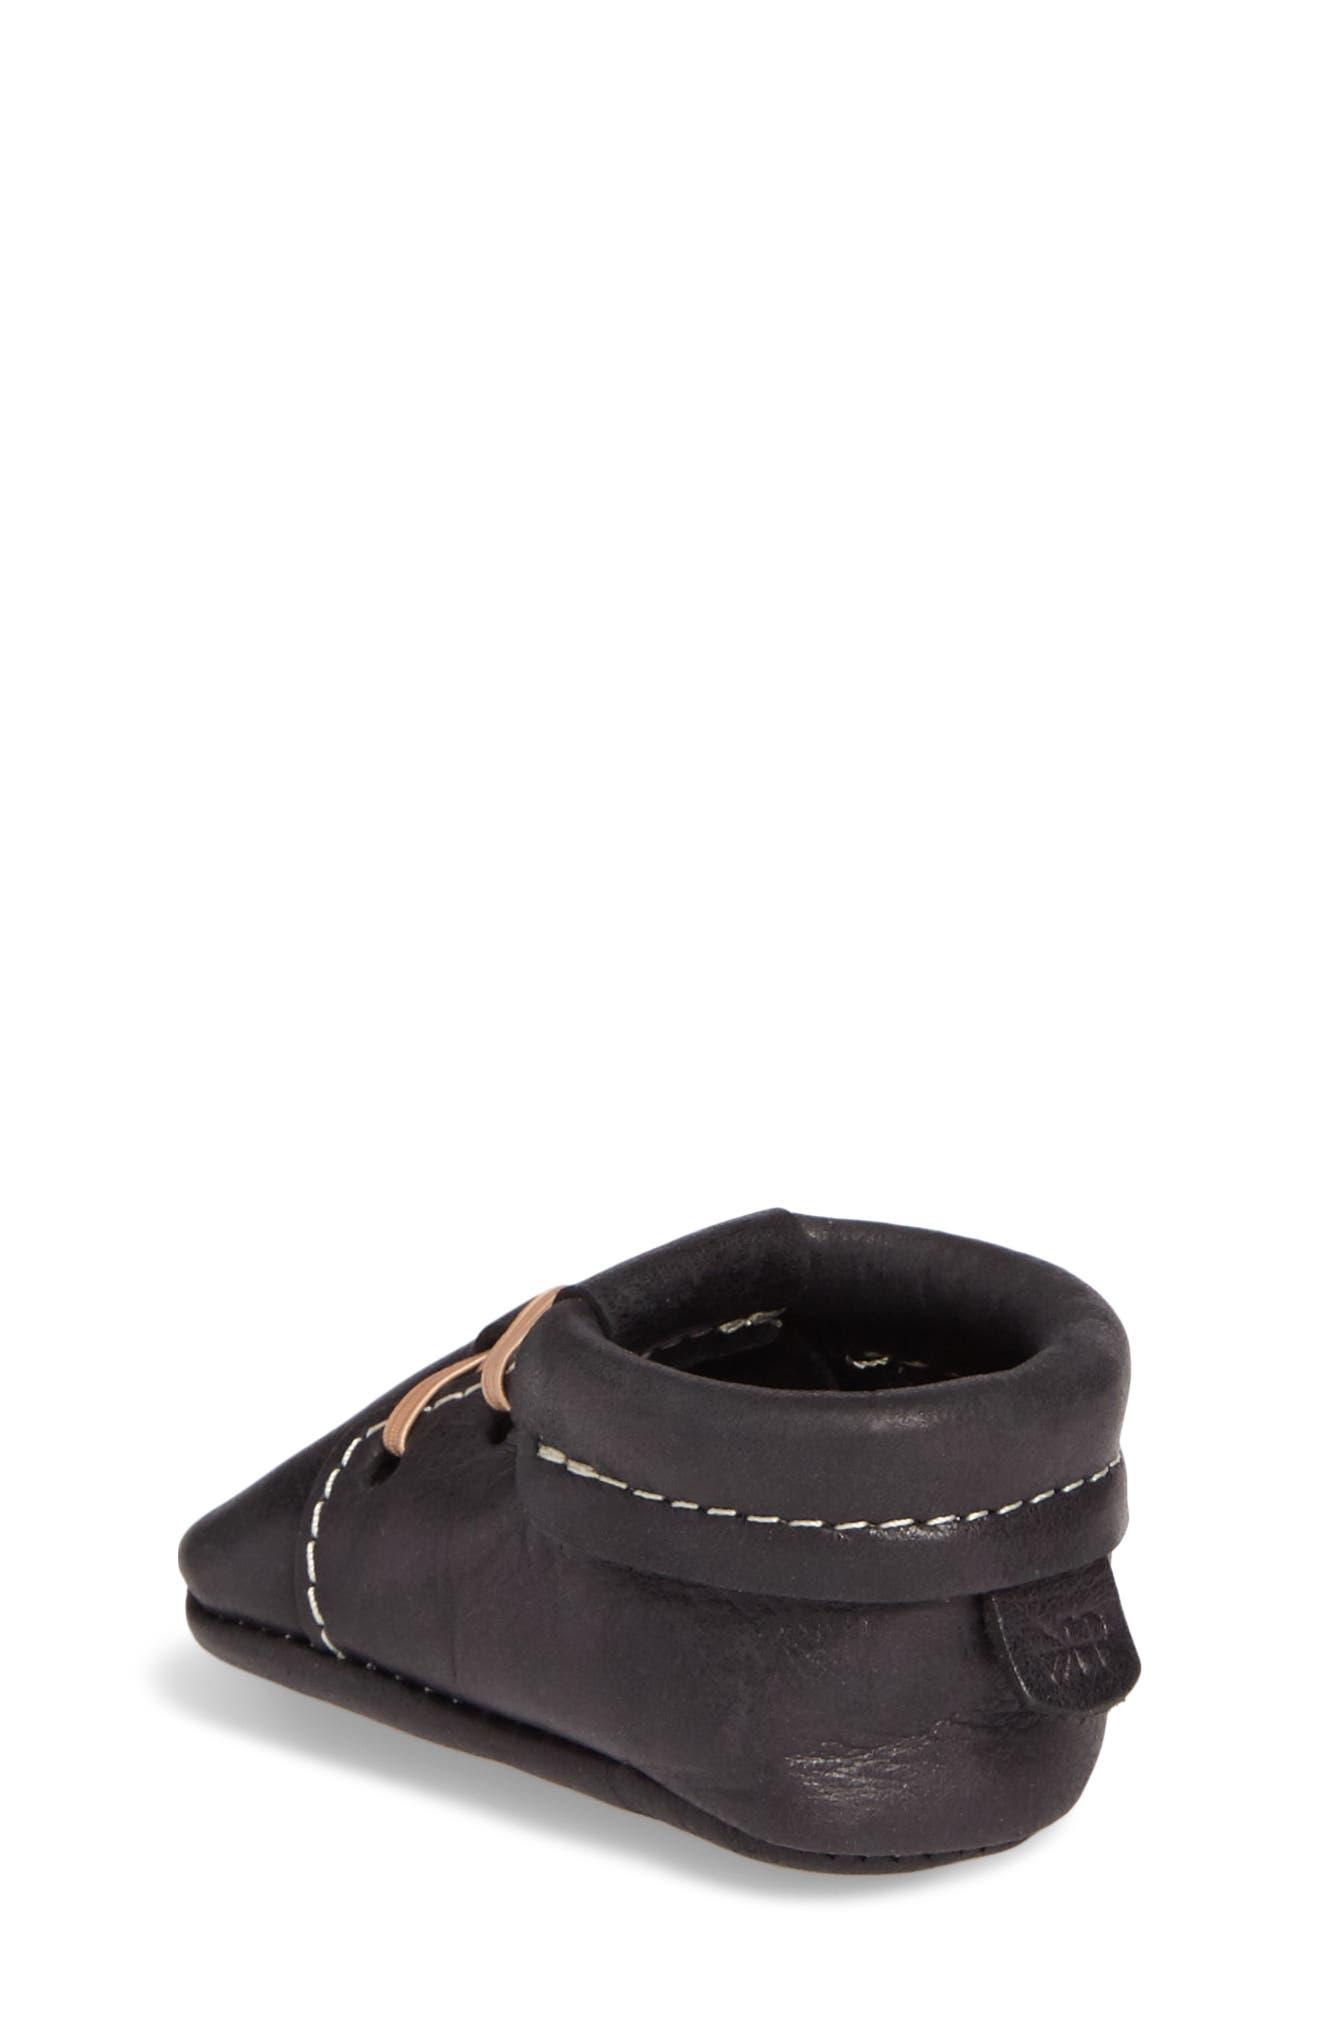 Oxford Crib Shoe,                             Alternate thumbnail 2, color,                             ONYX